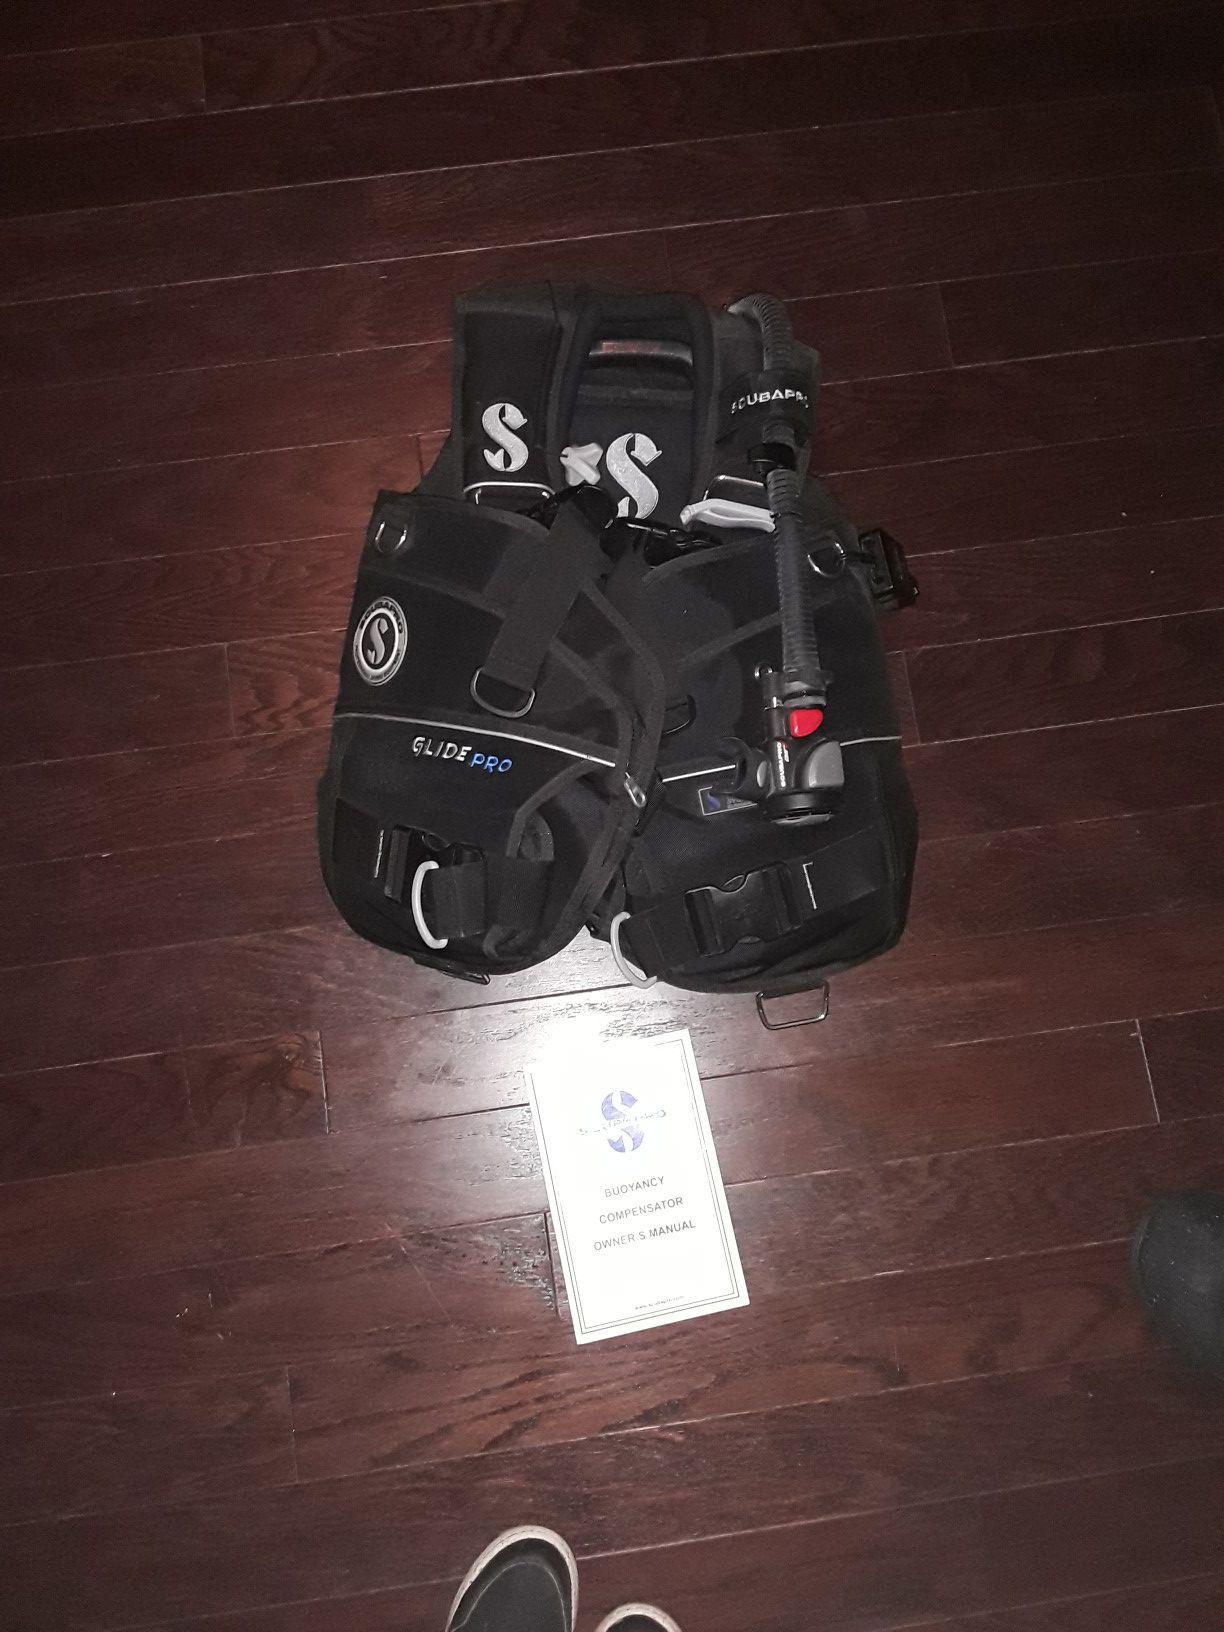 Scubapro gear bundle